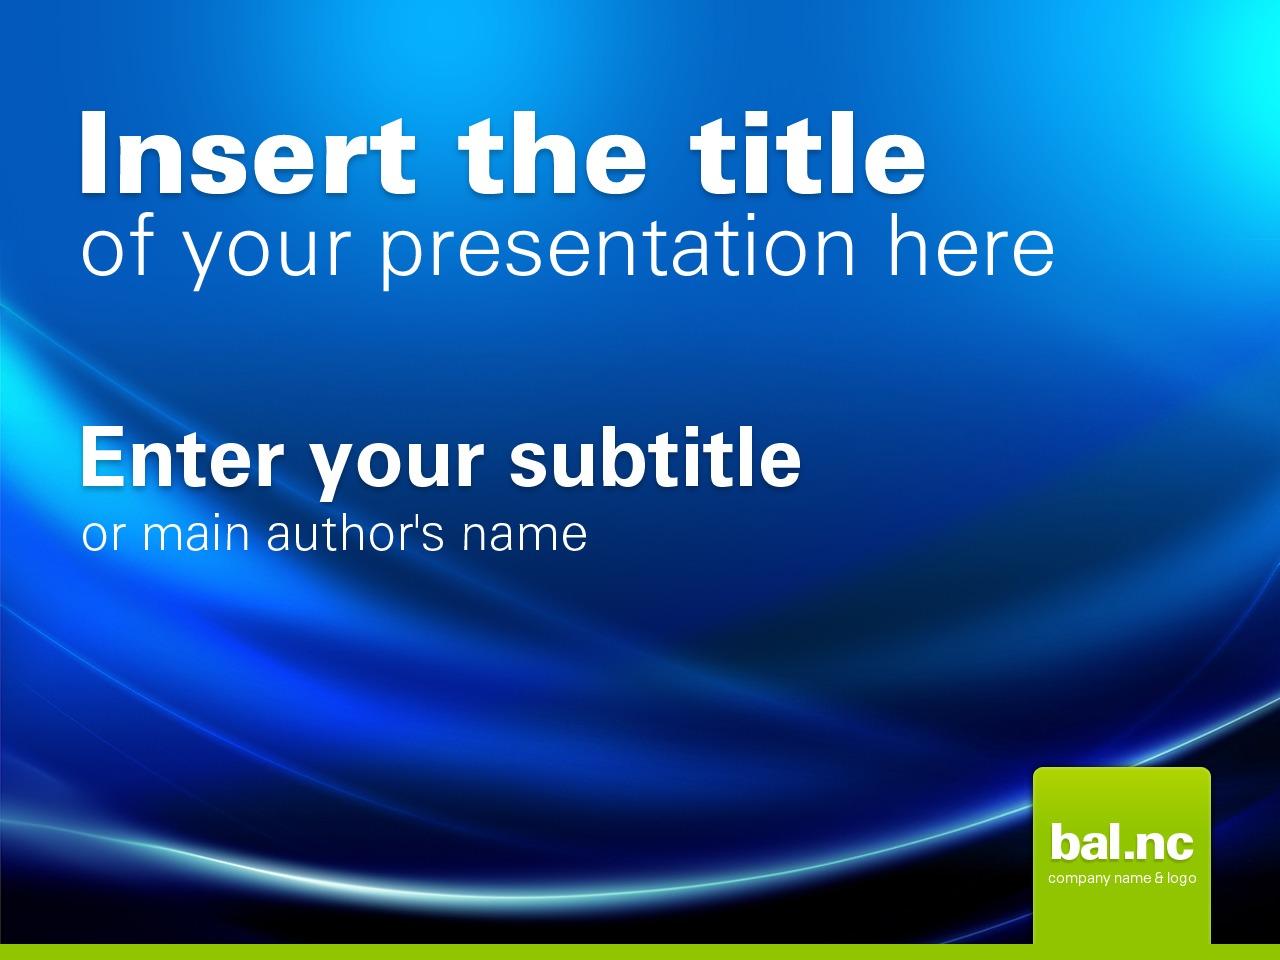 PowerPoint шаблон №24233 на тему бизнес и услуги